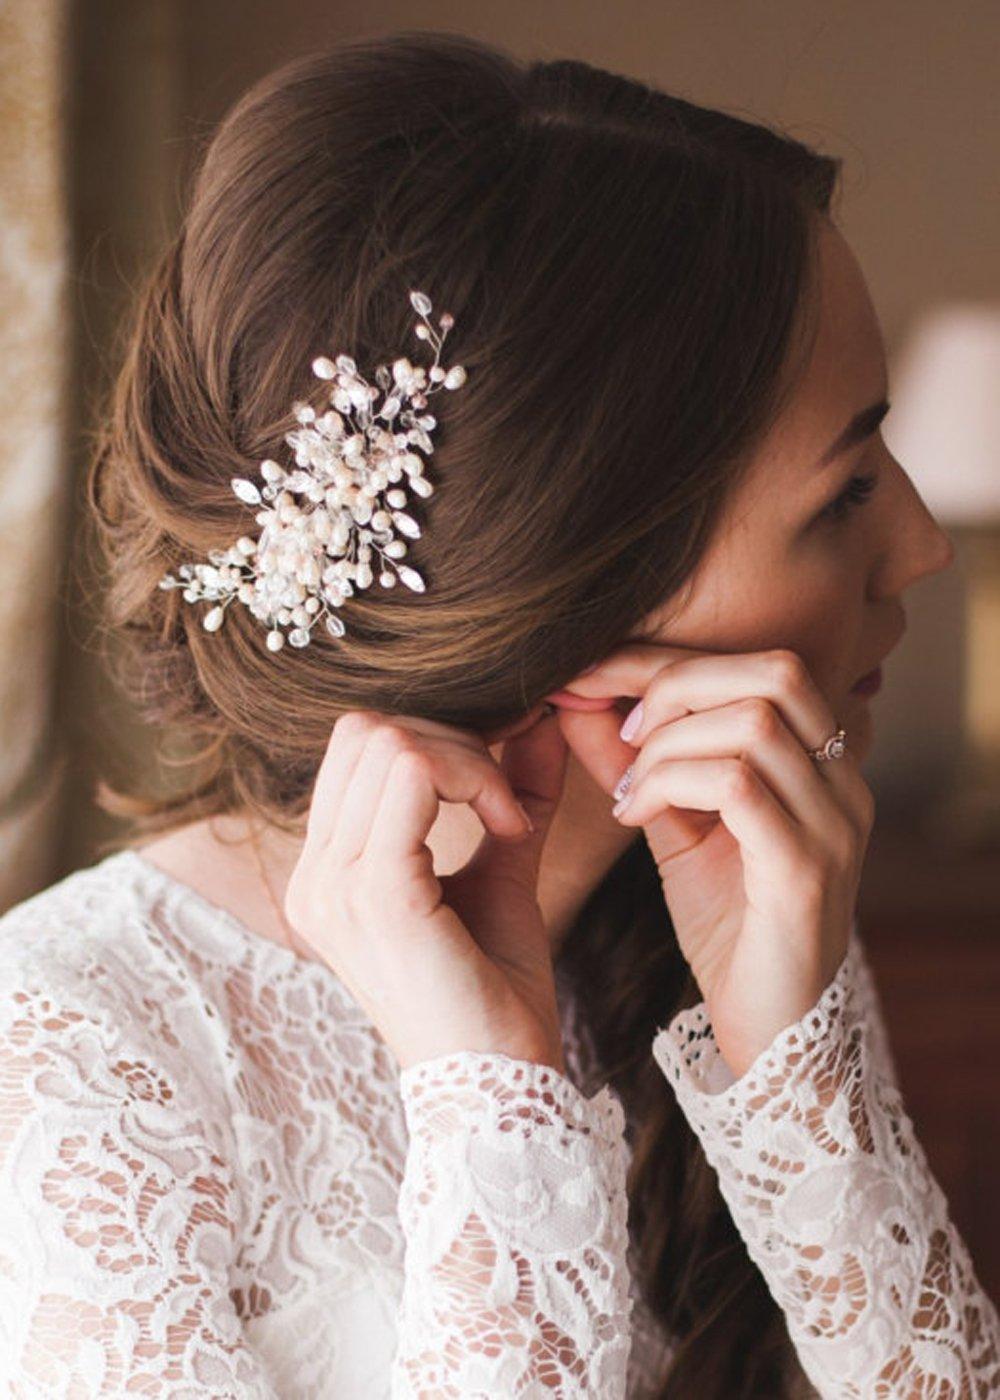 Kercisbeauty Wedding Bridal Bridesmaids Flower Girl Vintage Crystal Pearl Combs Headband Bridal Hair Comb Headpiece Long Curly Bun Hair Accessories,Wedding Hair Piece Vintage Hair Comb (Gold)